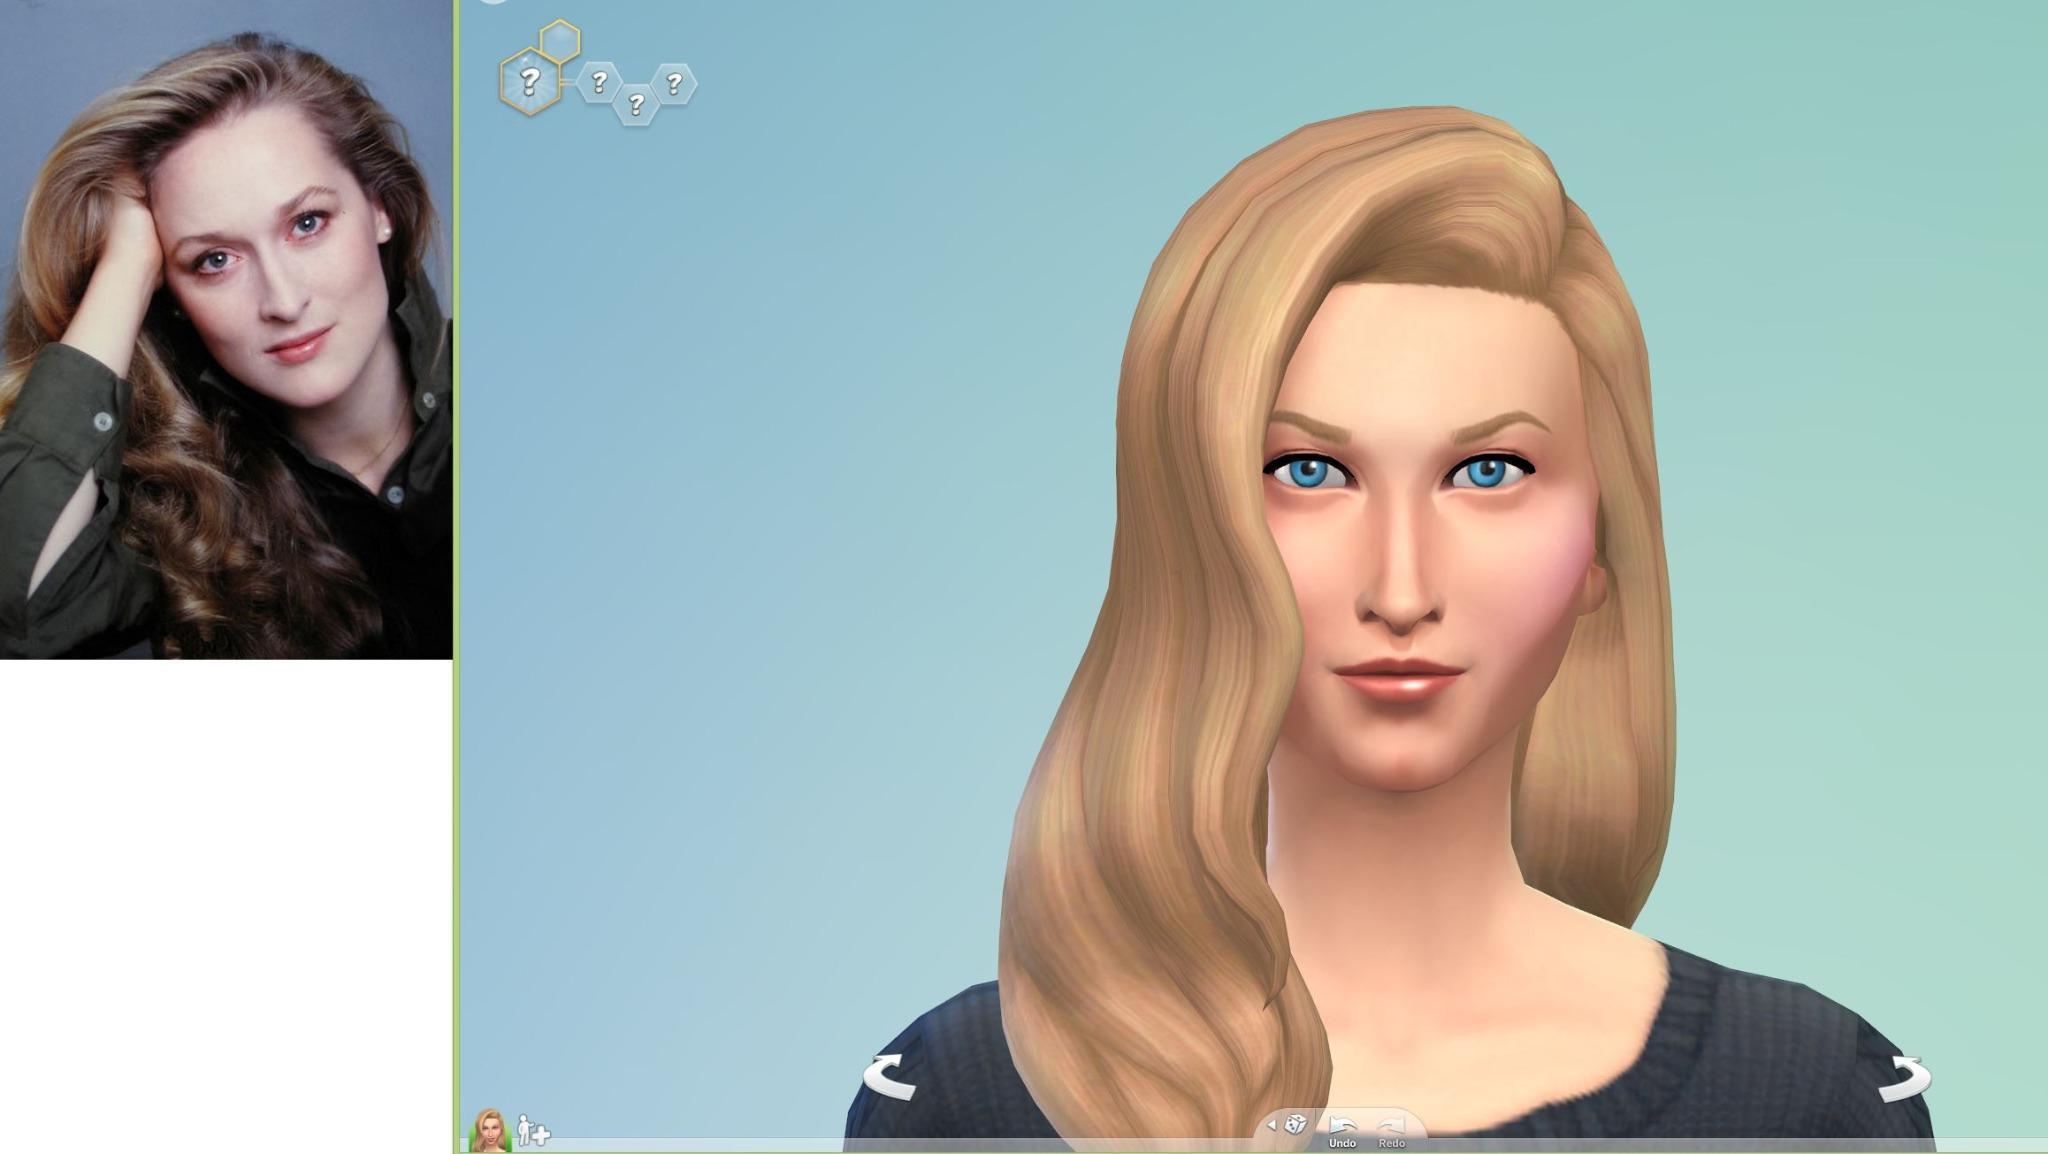 Sims 4 RedHead Sims CC downloads » Sims 4 Updates